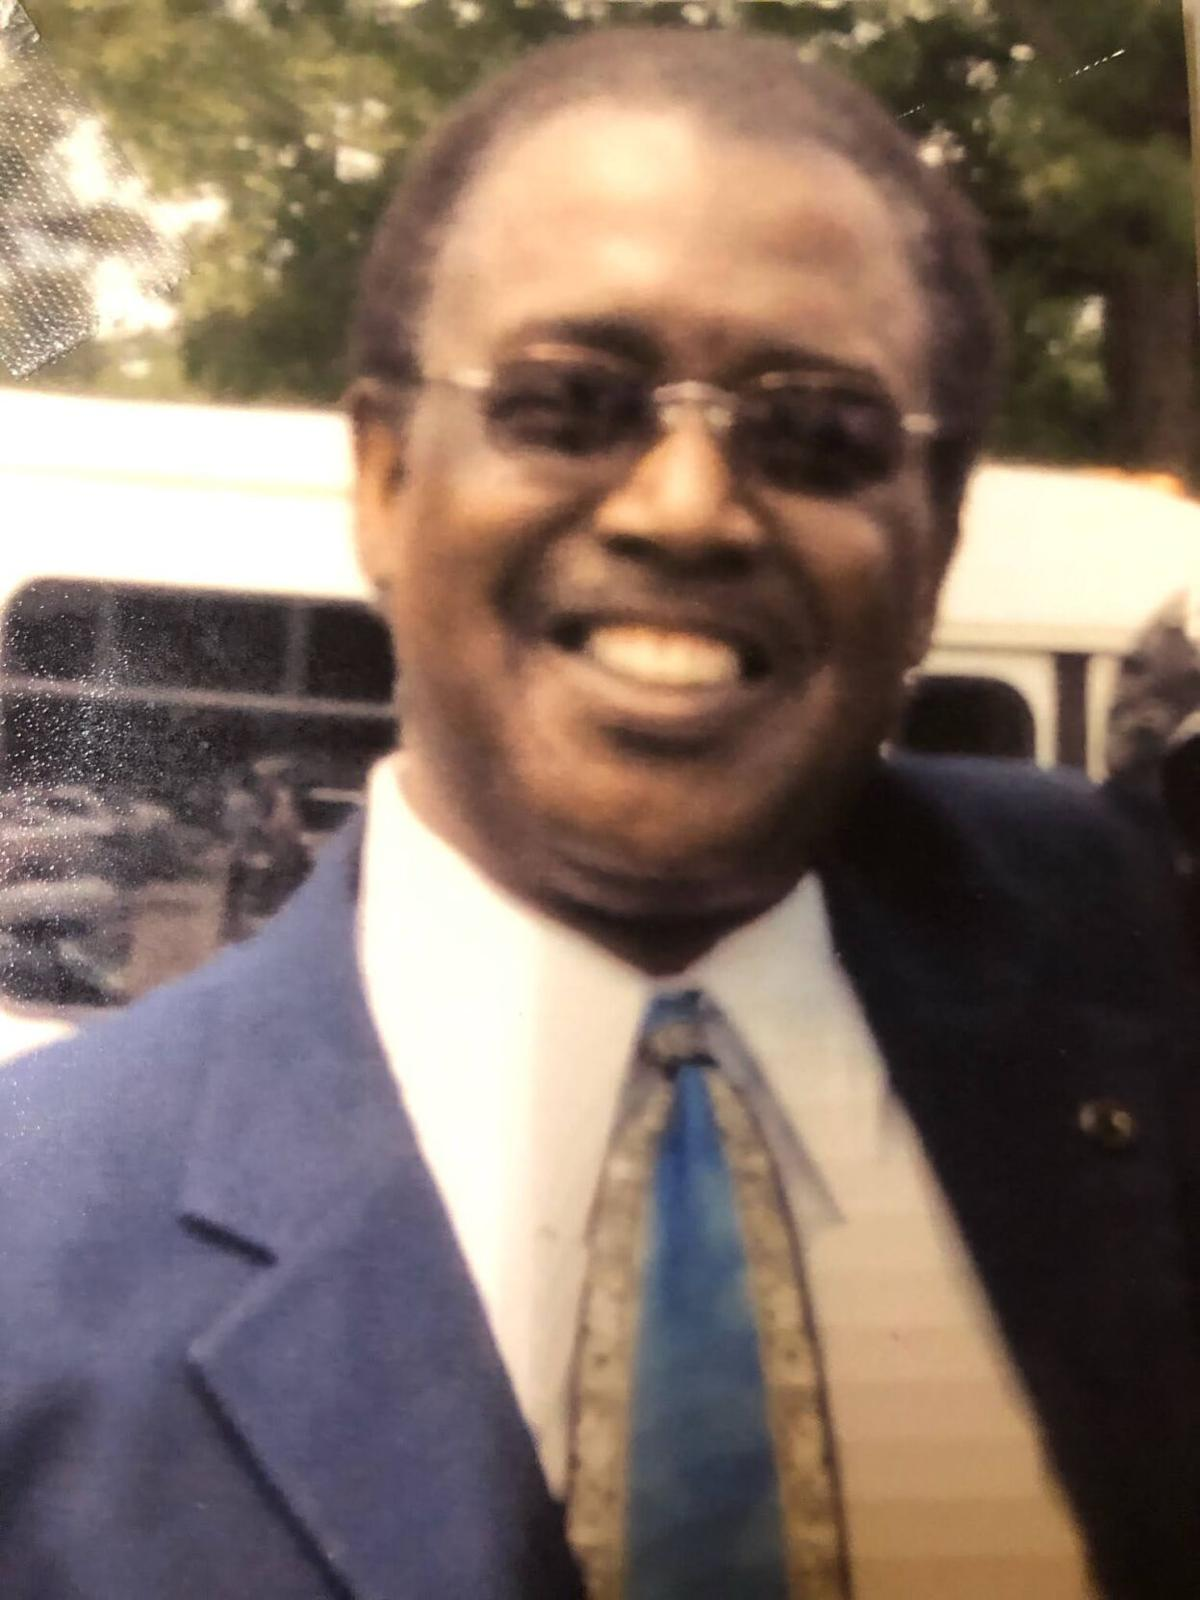 Minister Walter Prater